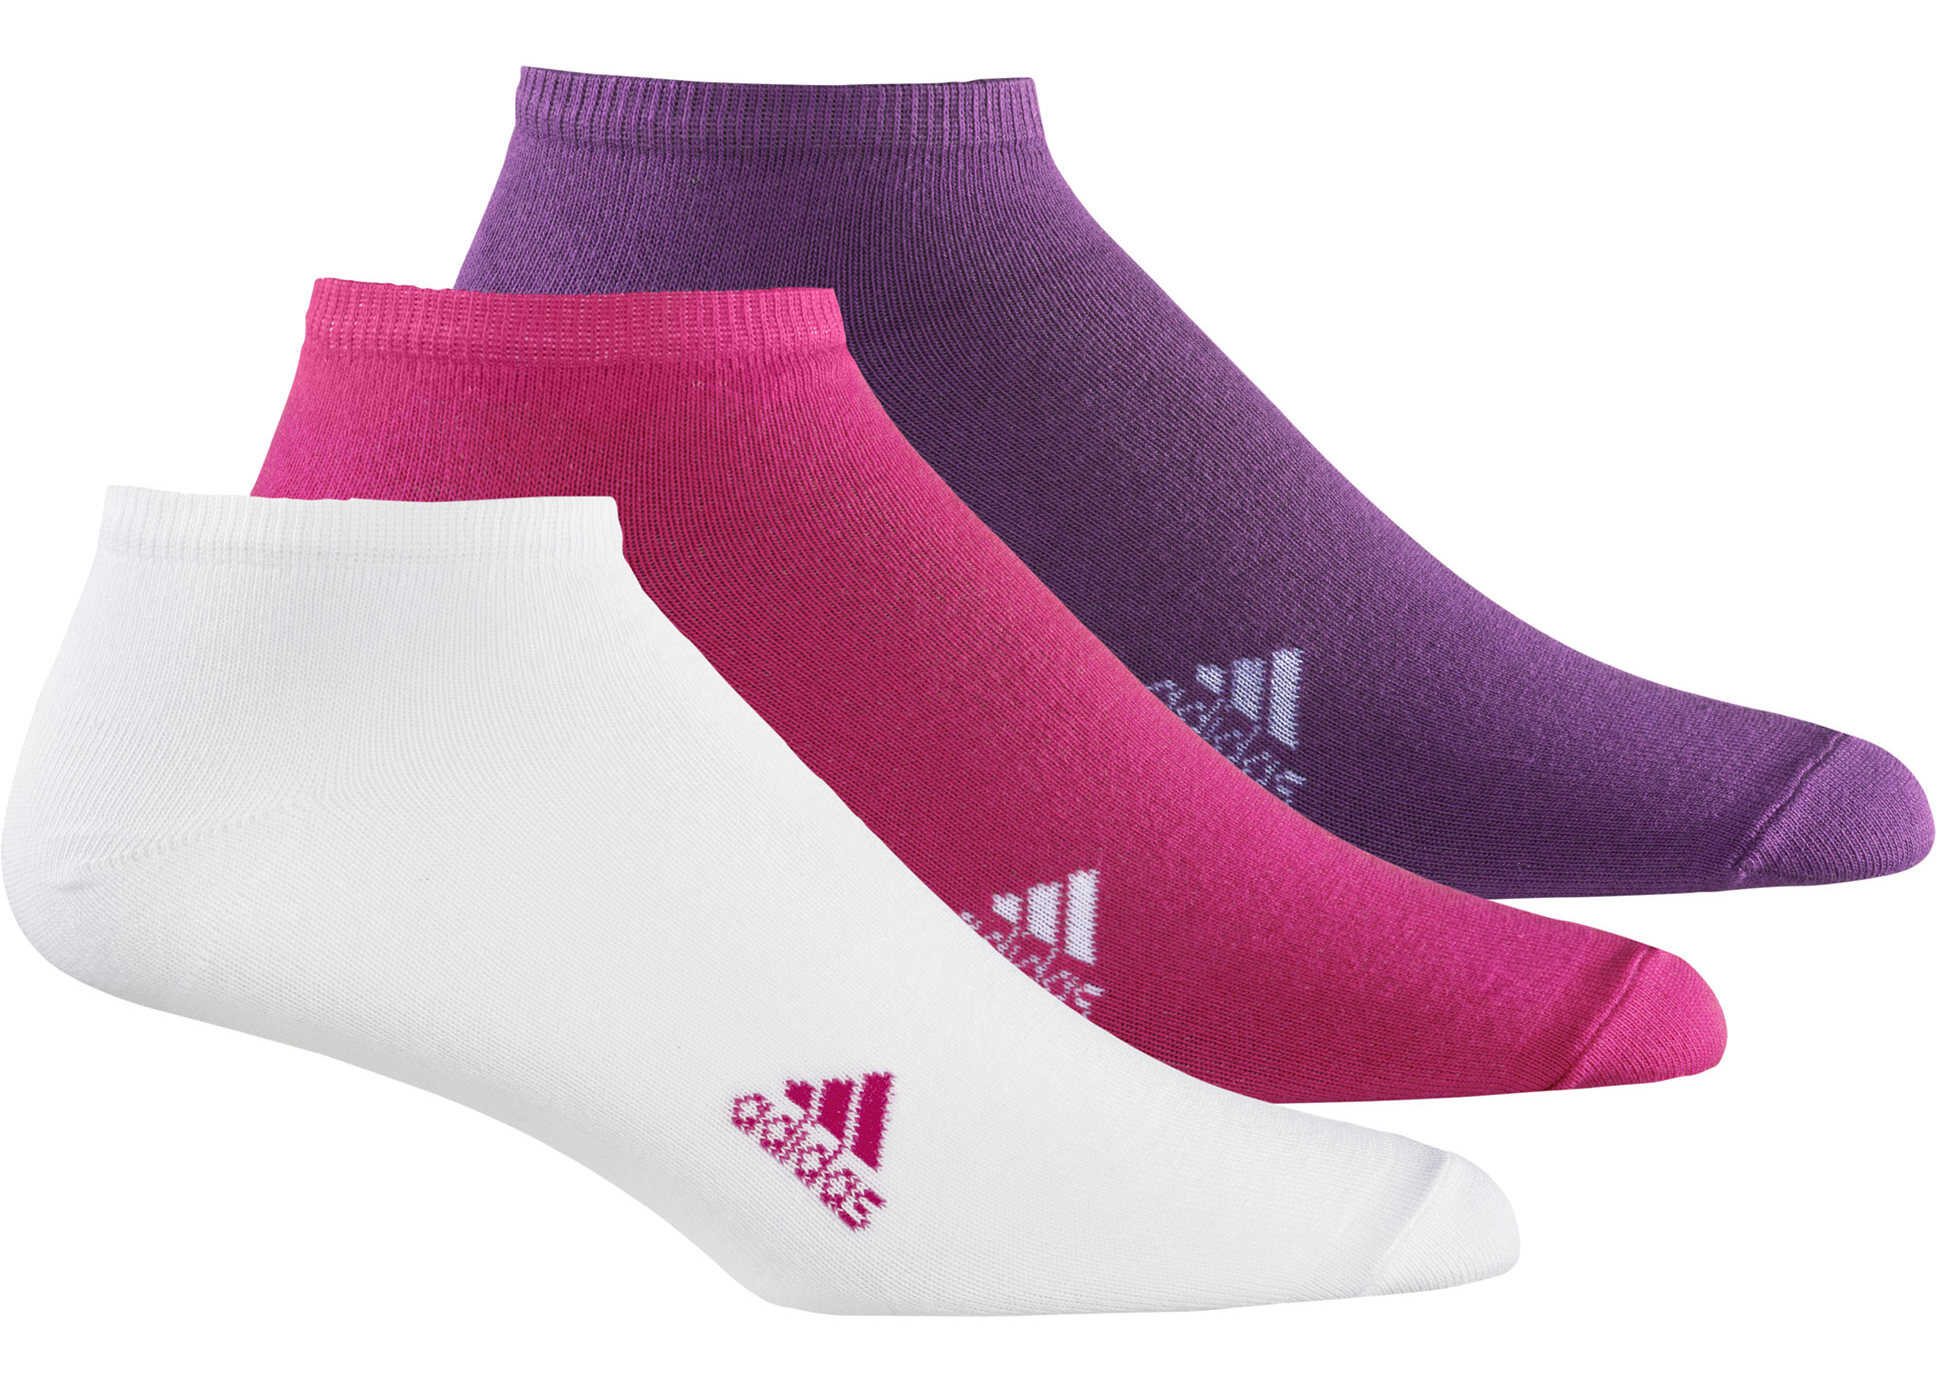 adidas LIN PLAIN T 3PP VIVBER/WHT/TRIPUR